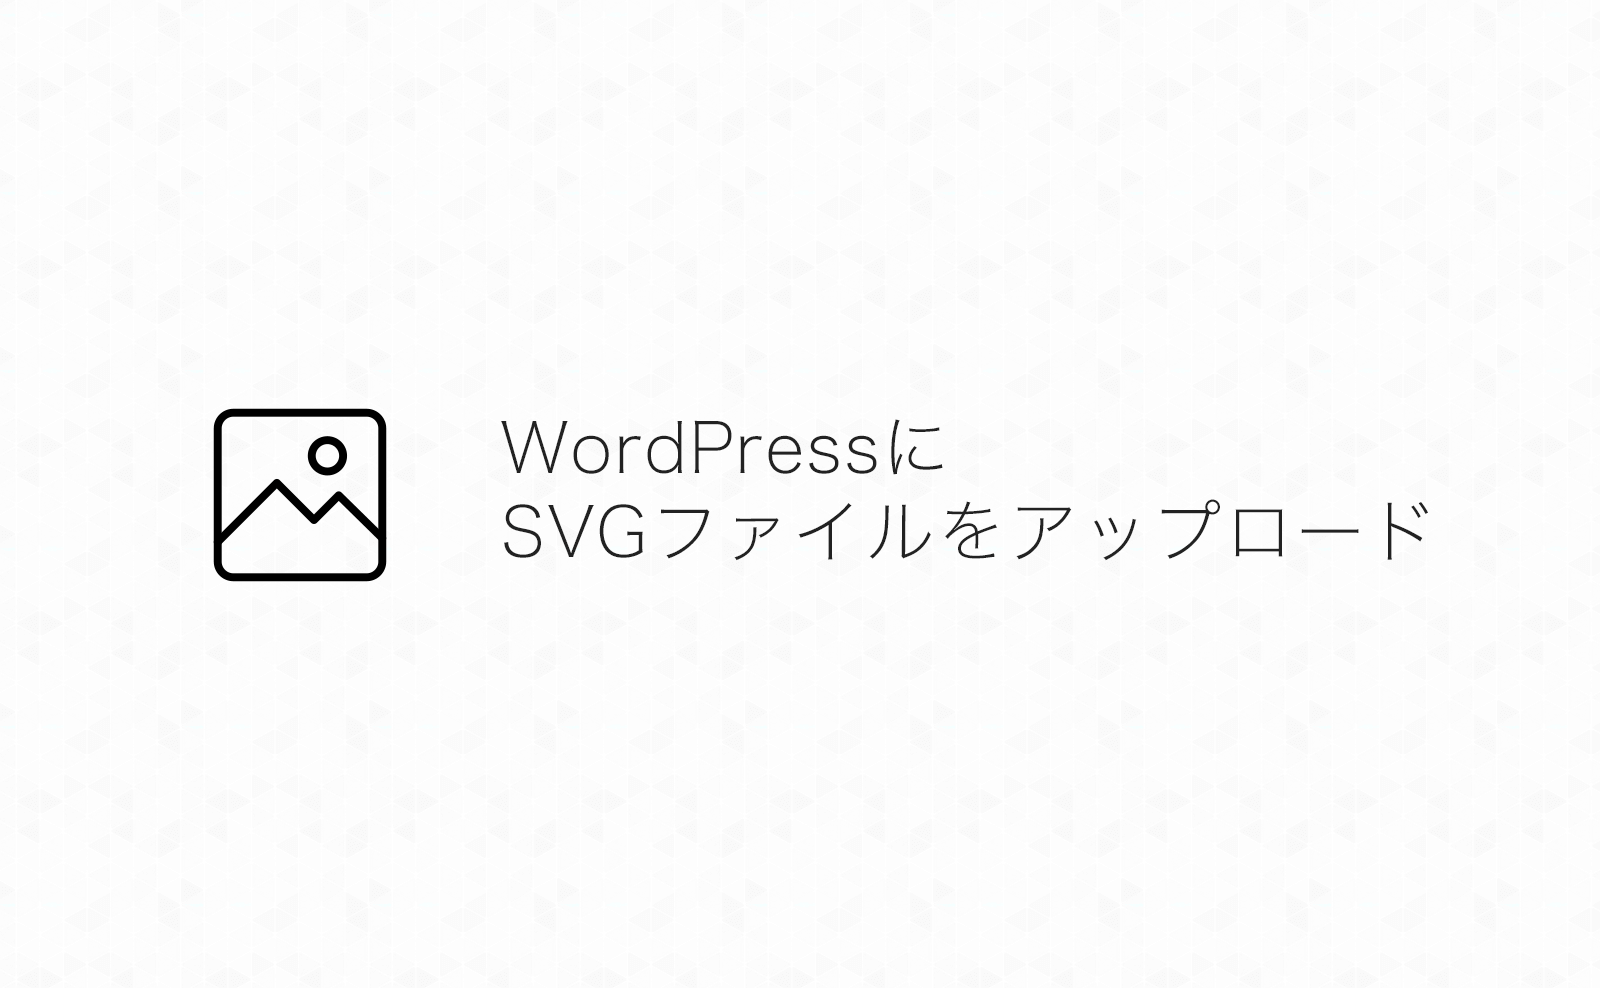 【WordPress】管理画面からSVGファイルをアップロードできるようにするプラグイン「Safe SVG」